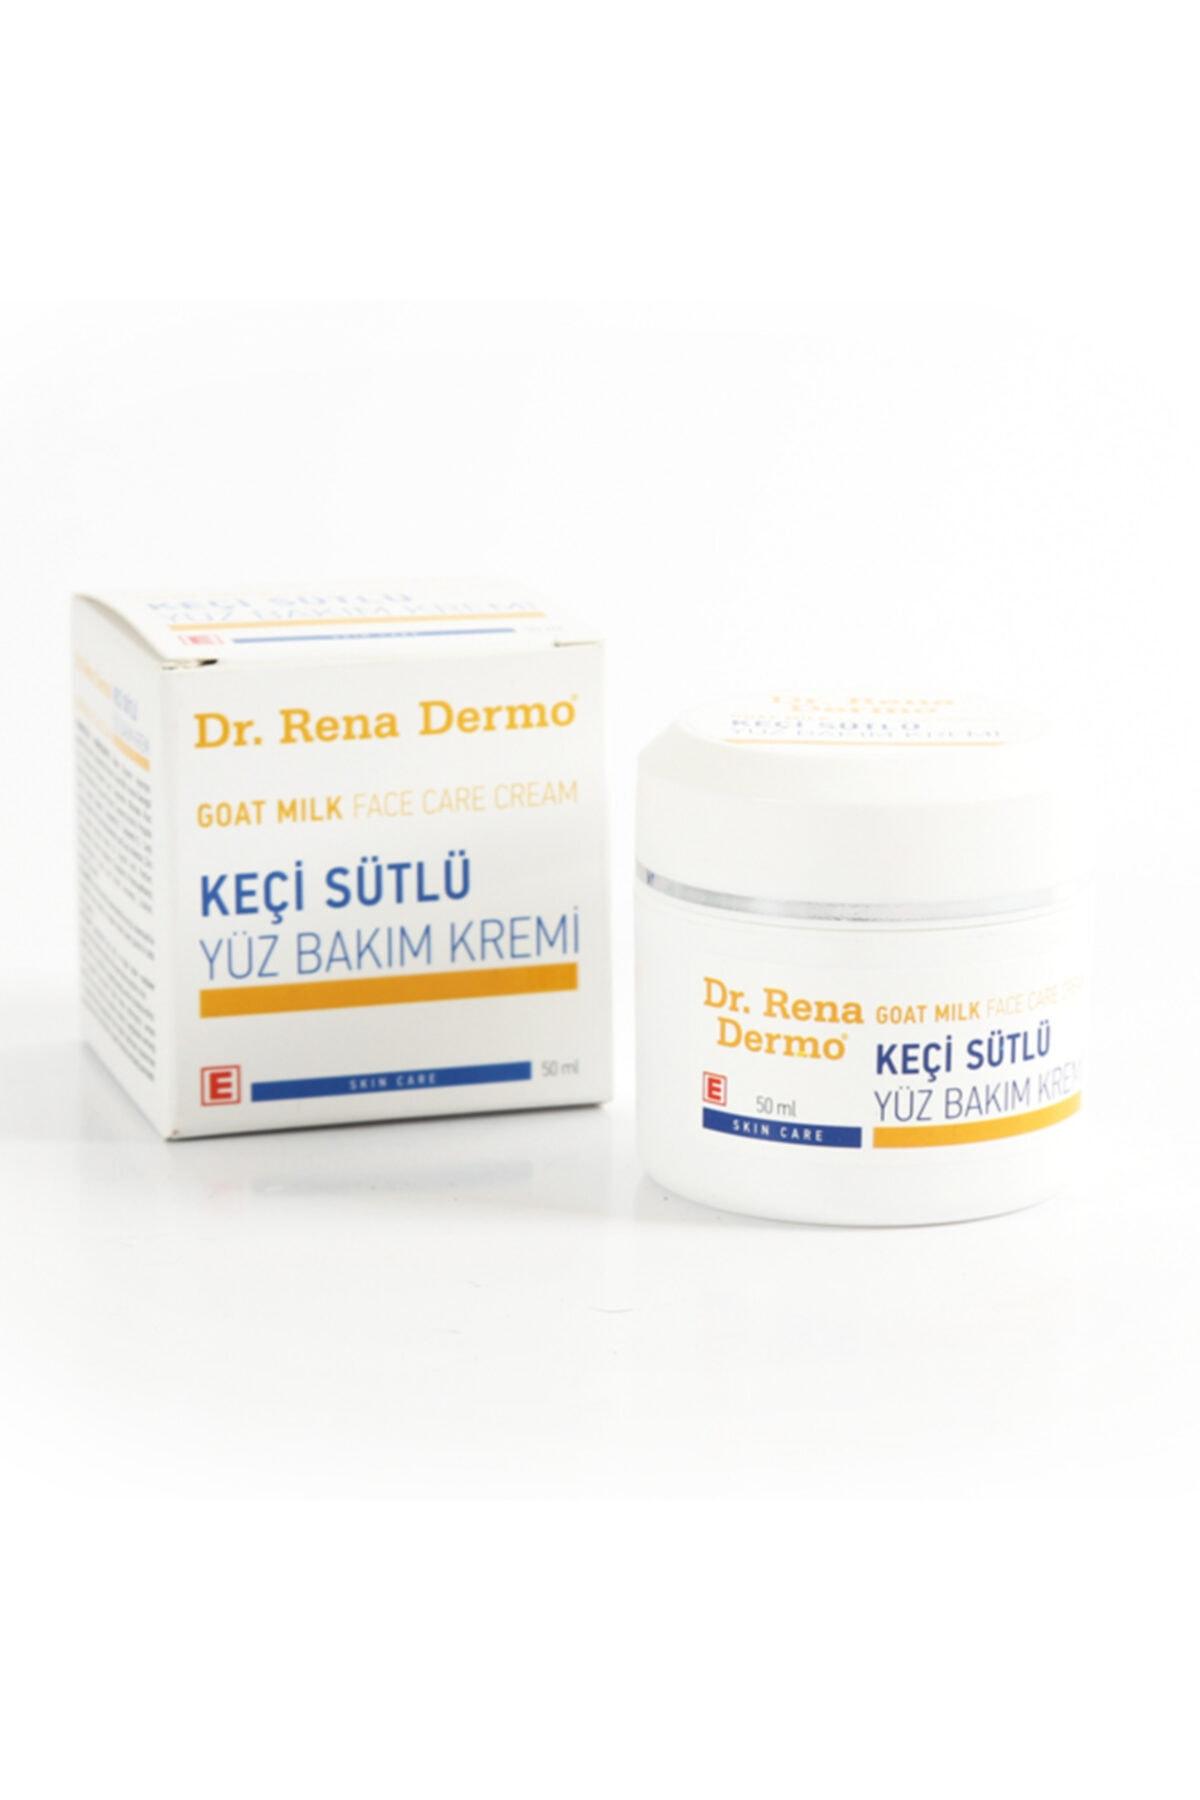 Redist Dr. Rena Dermo Keçi Sütlü Yüz Bakım Kremi 50 ml 1